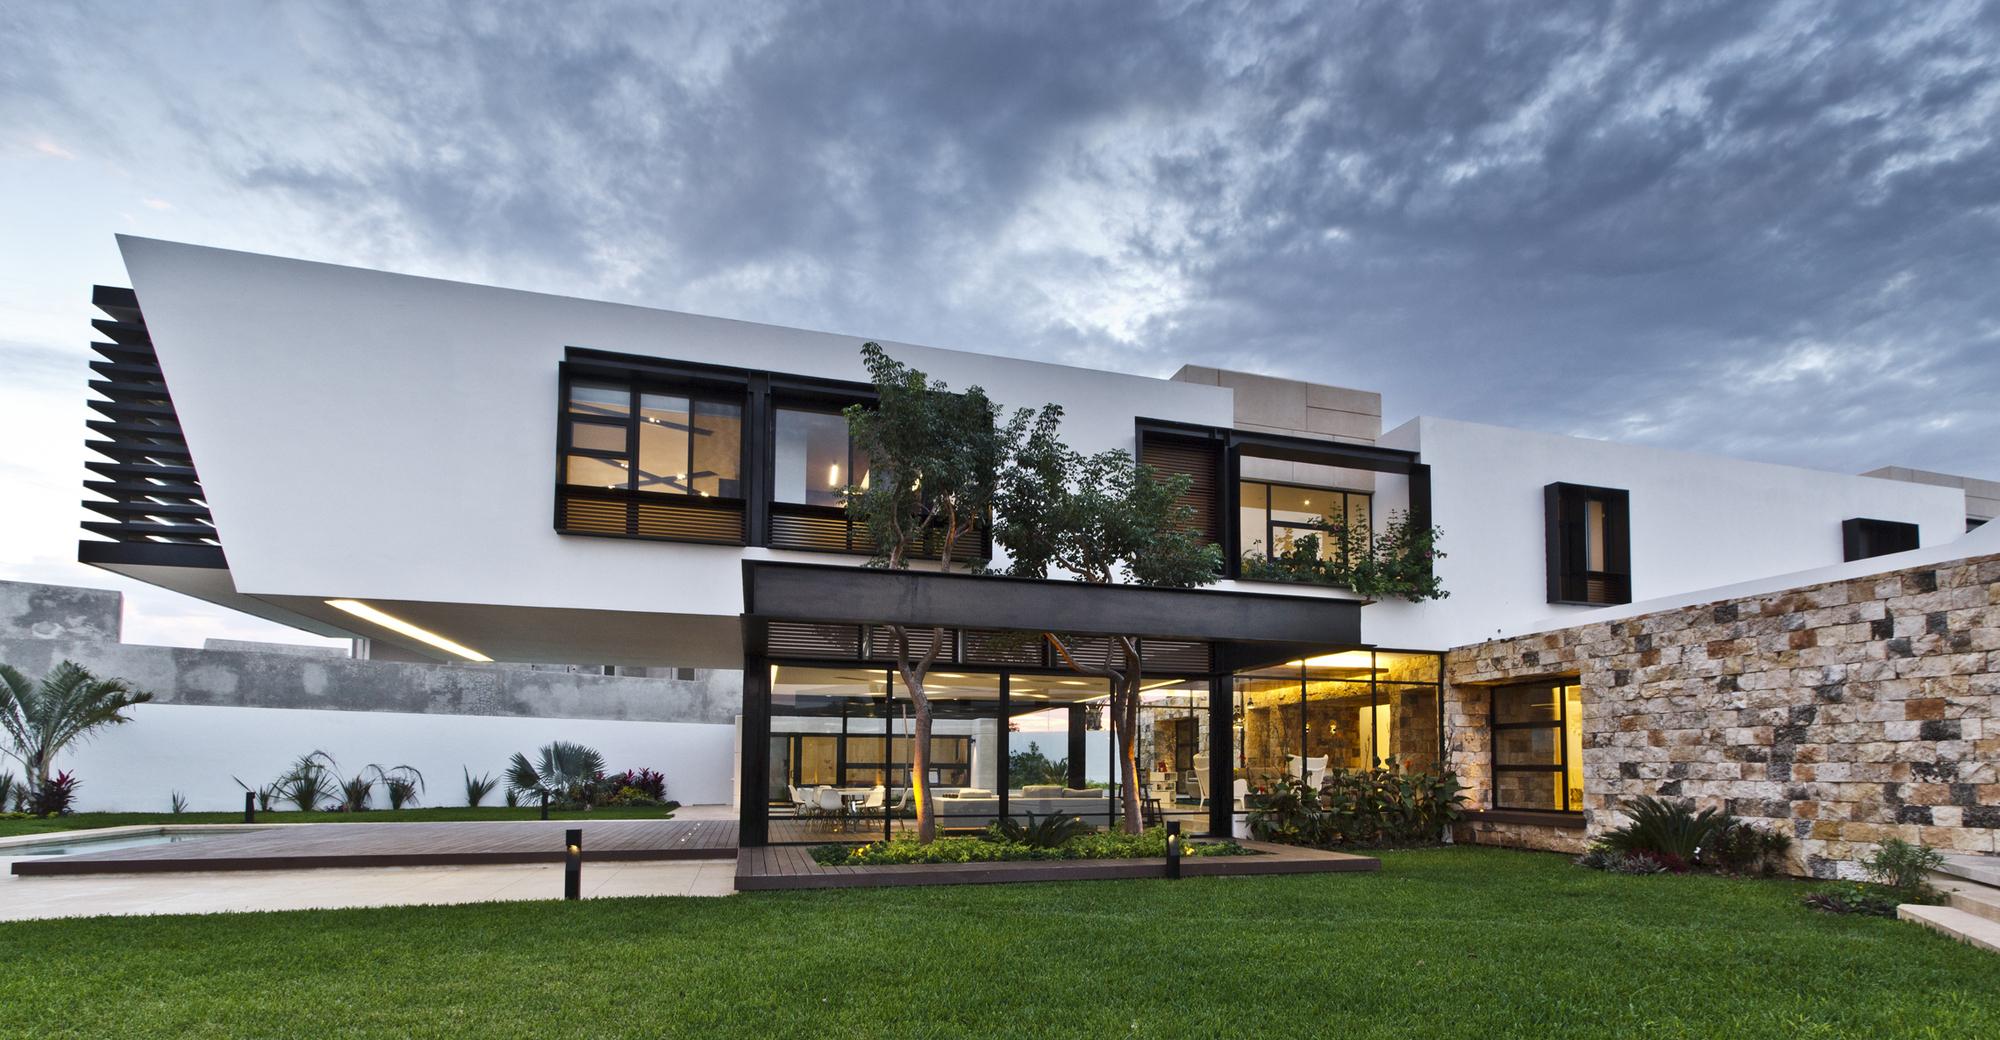 Temoz N House By Carrillo Arquitectos Y Asociados Caandesign Architecture And Home Design Blog